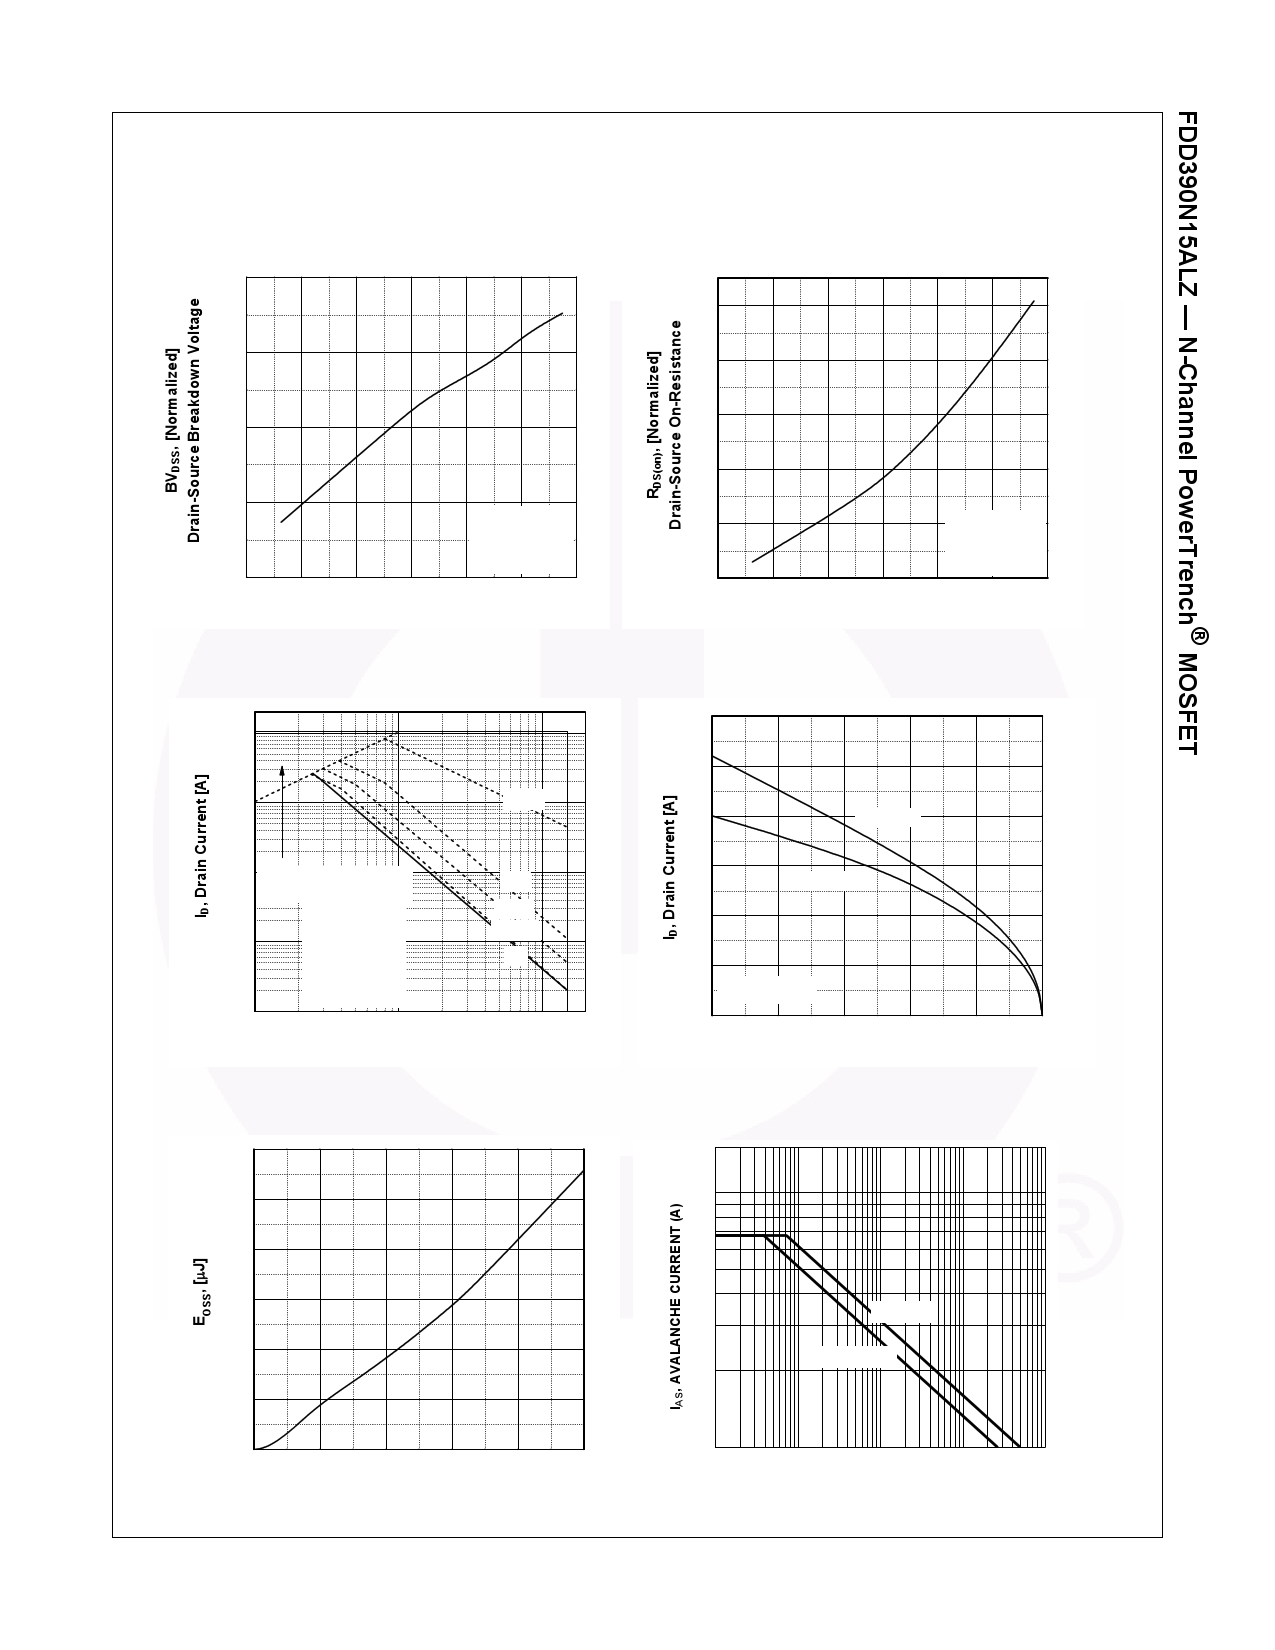 FDD390N15ALZ pdf, 반도체, 판매, 대치품